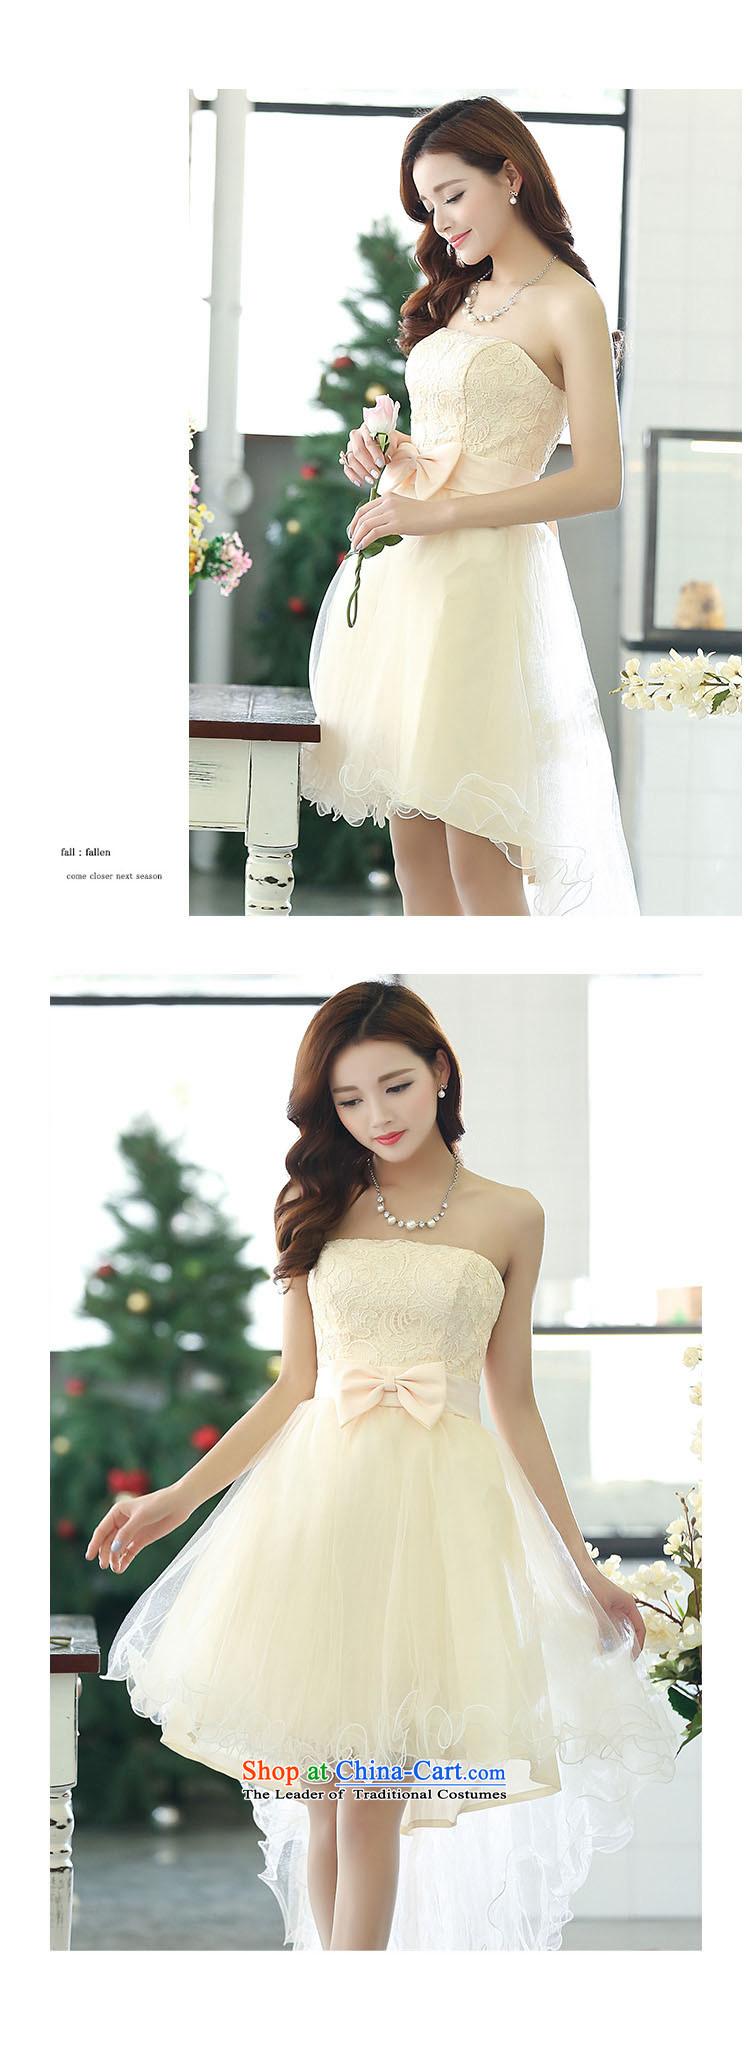 To Dress The Girla 2015 Dream Autumn New Bride Wedding